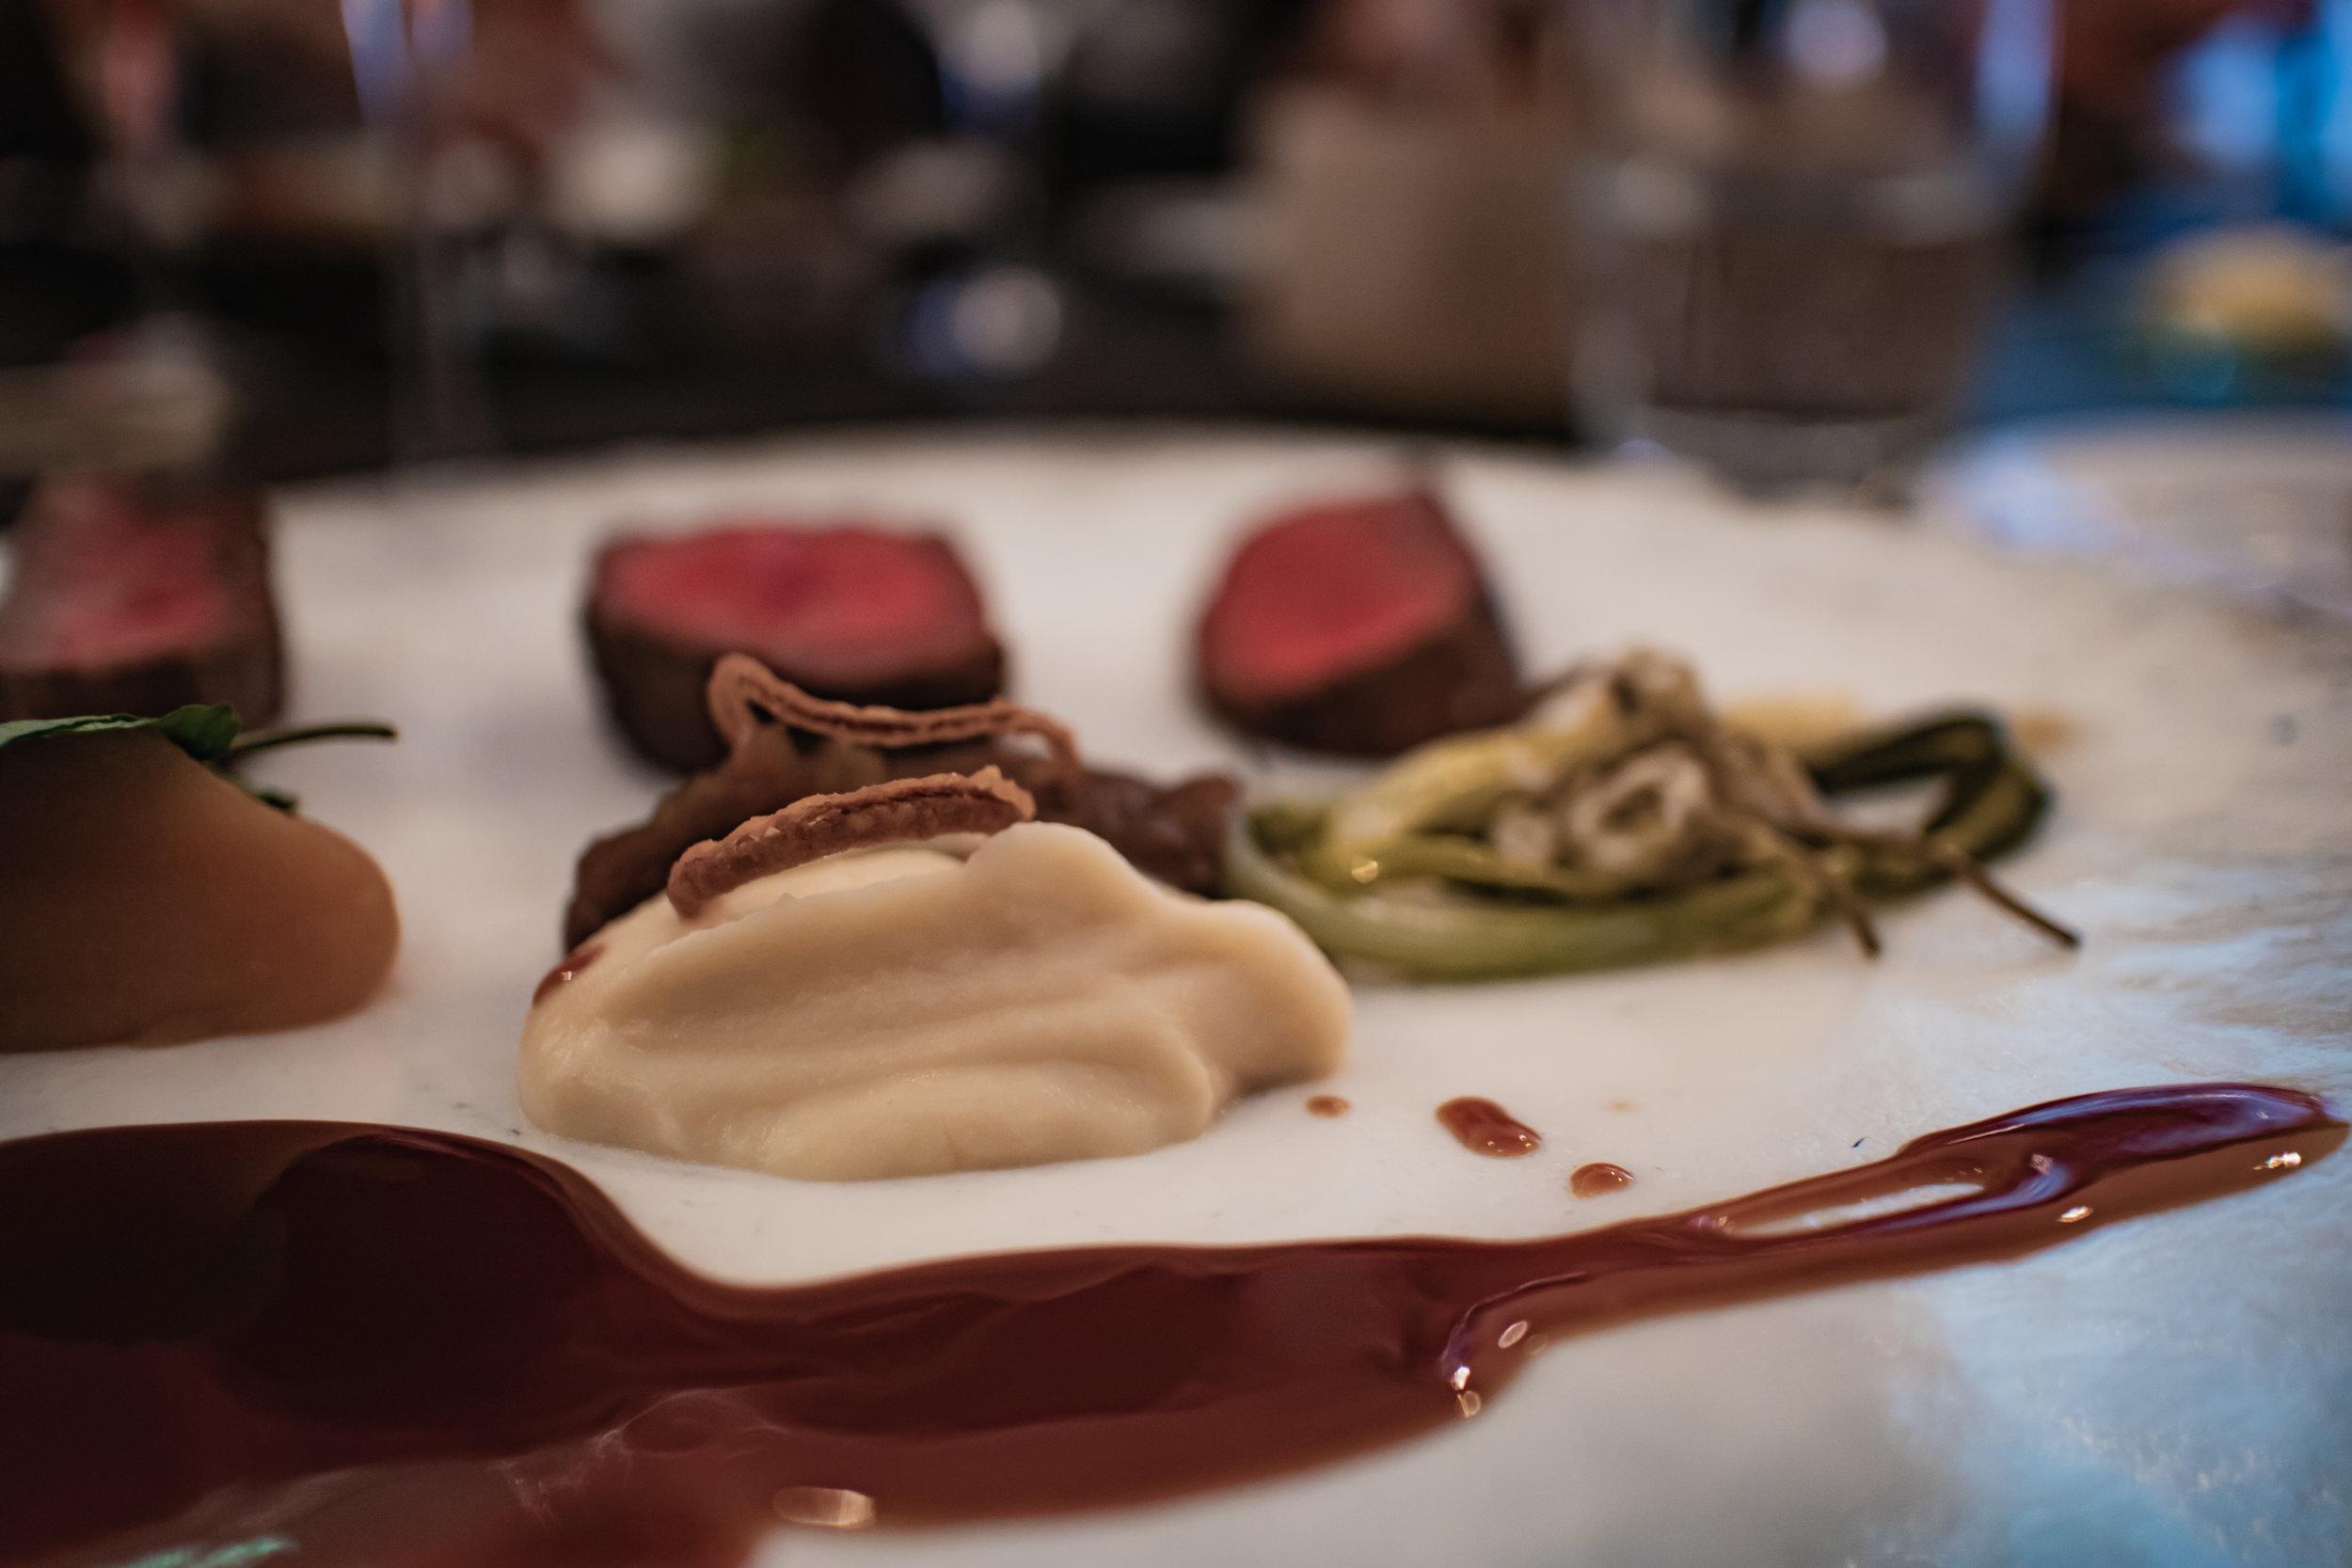 course 3: taste - Dry-aged beef, three types of garnish2014 Flor de Pingus, Domino De Pingus, Ribera Del DueroUnnatural nature